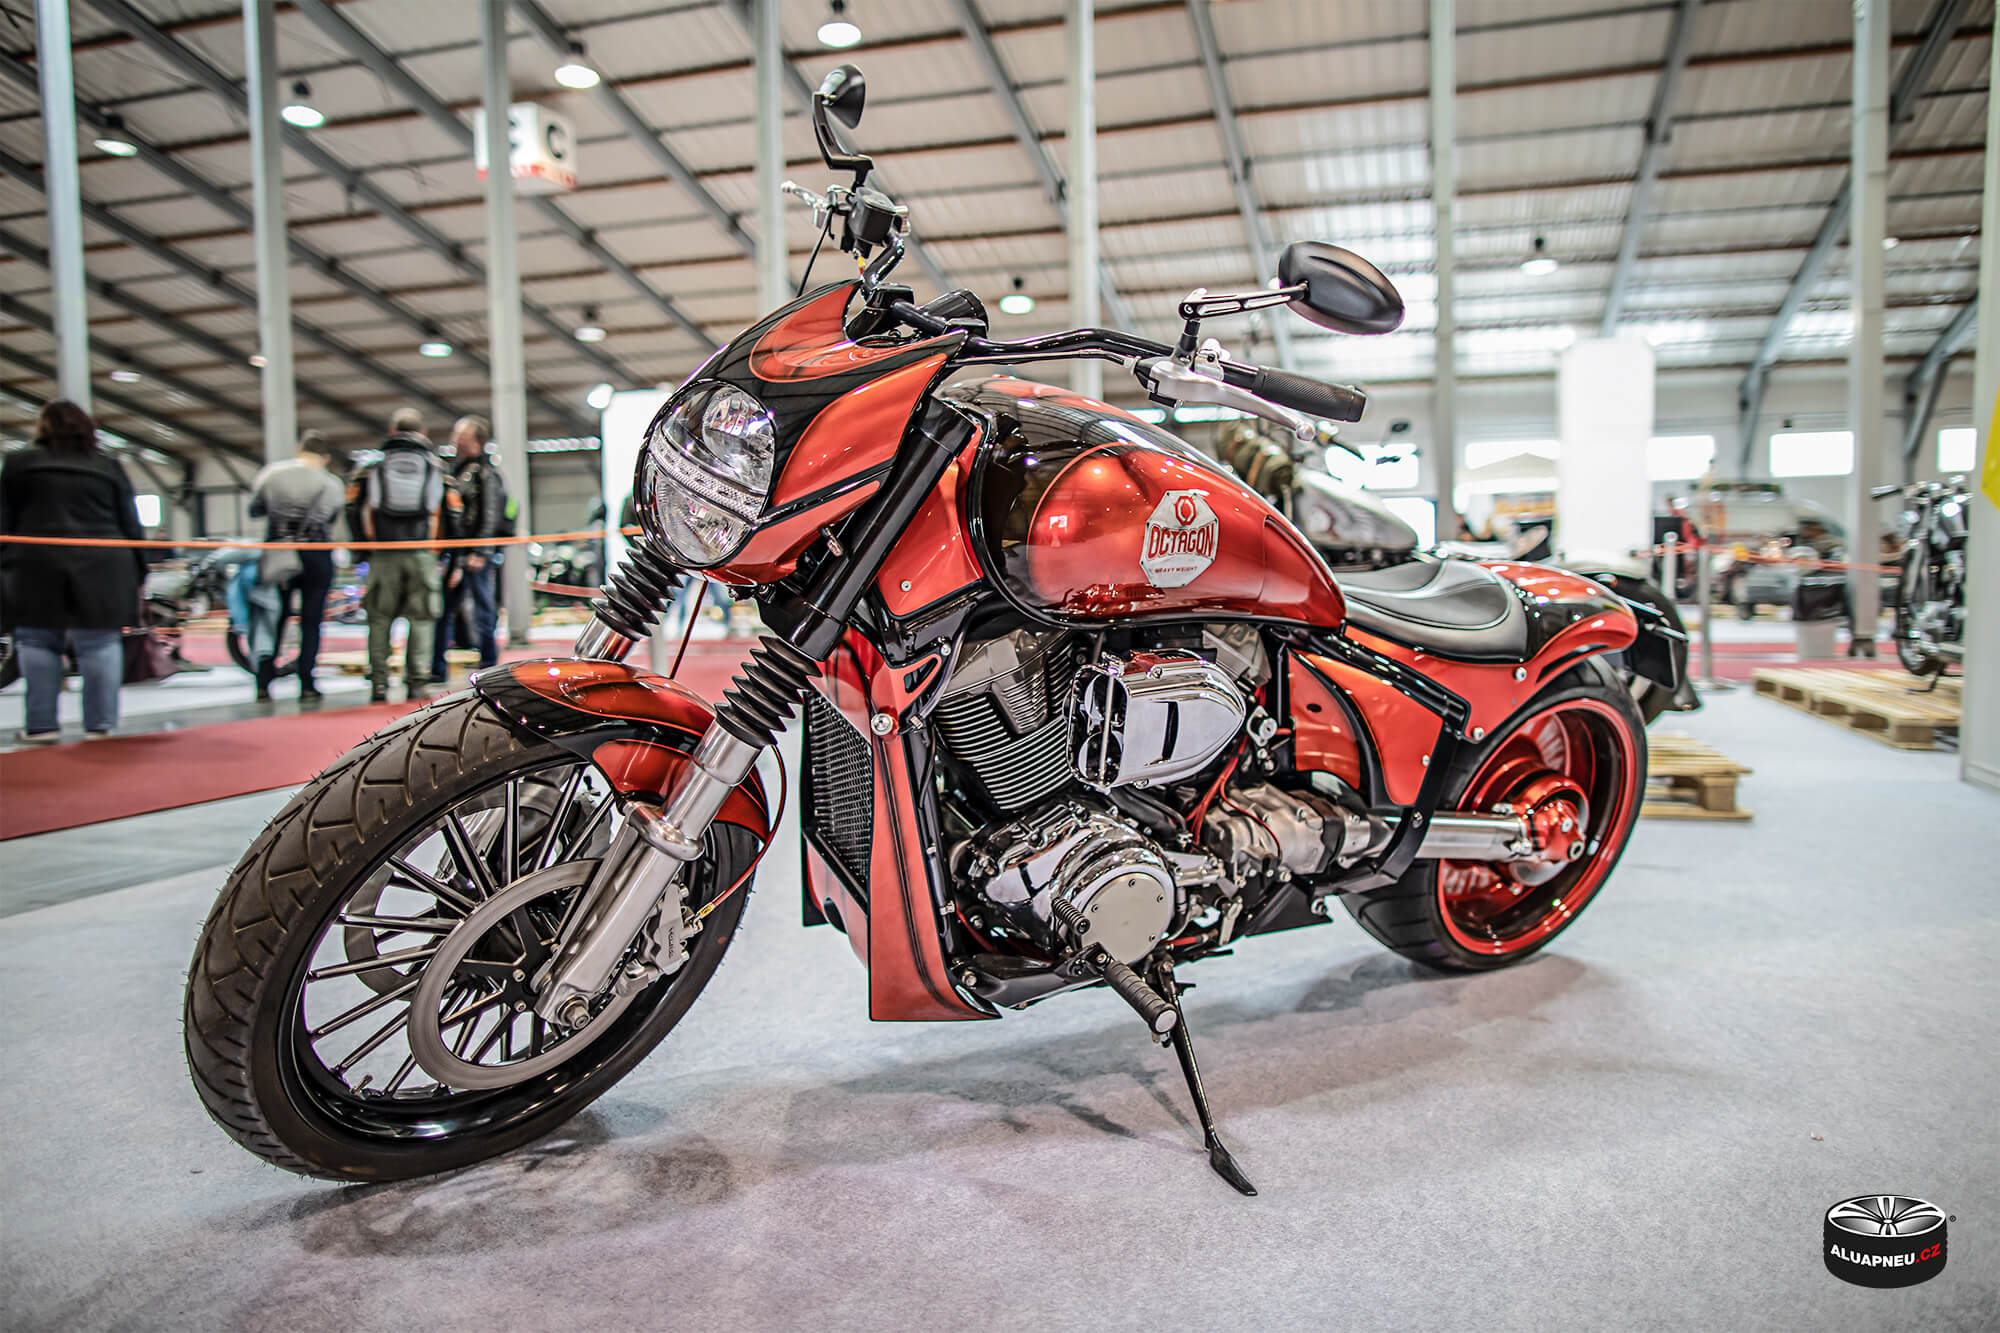 Motocykl Octagon - Autosalon Praha 2019 - www.aluapneu.cz